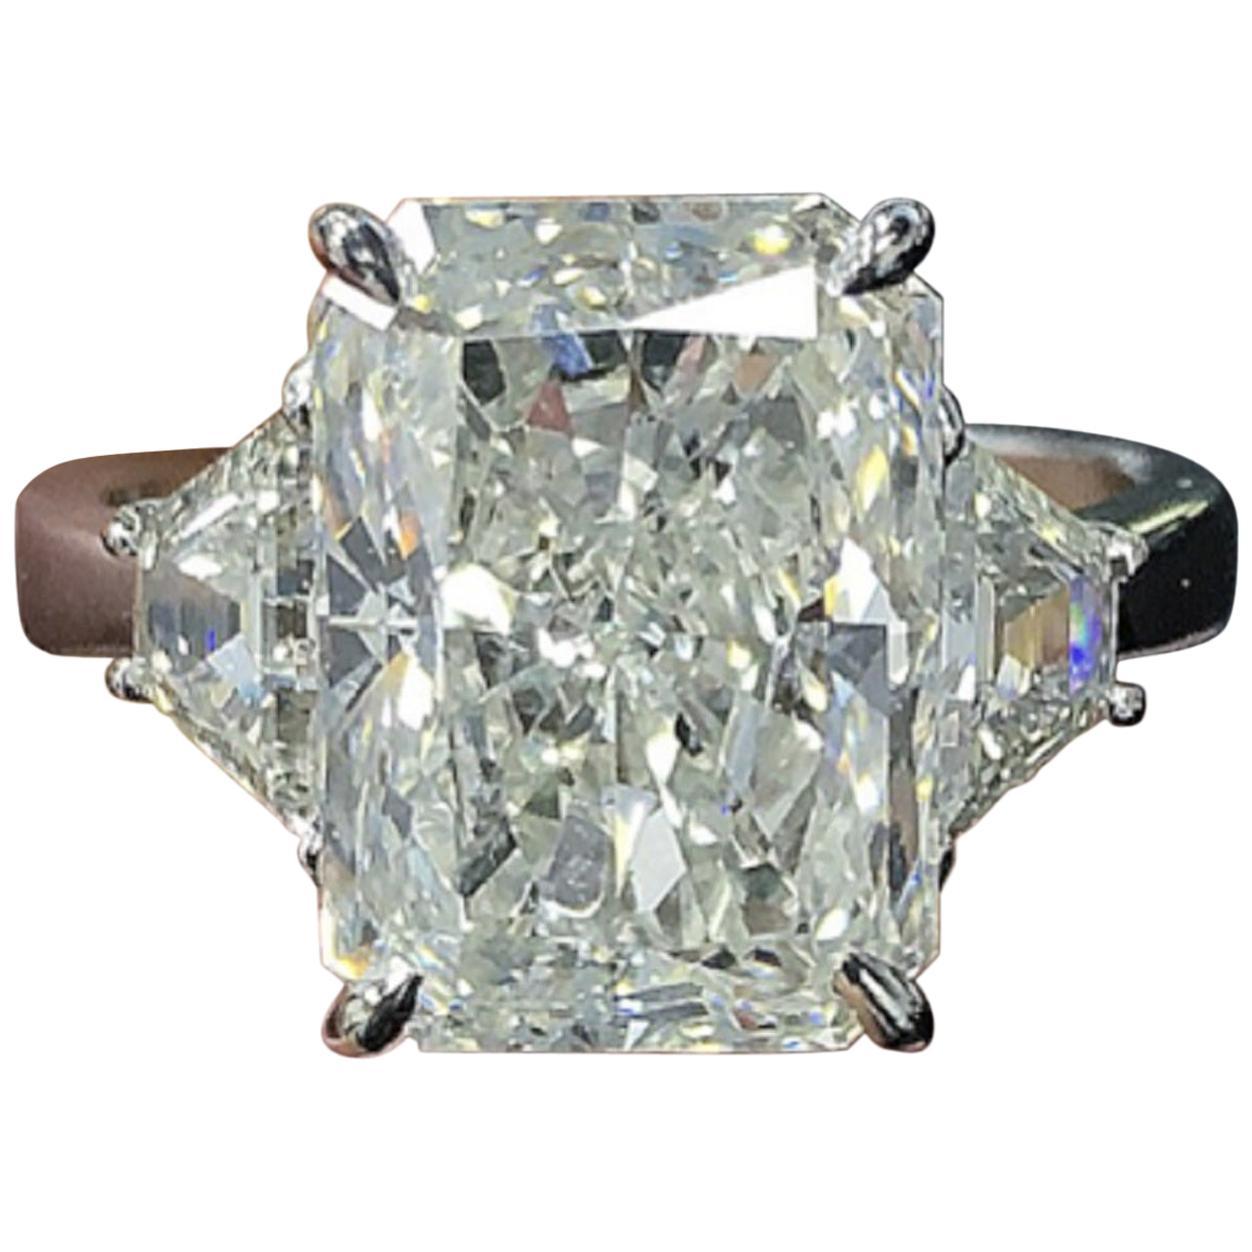 GIA Certified 3.50 Carat Long Radiant Cut Diamond Ring Triple Excellent Cut